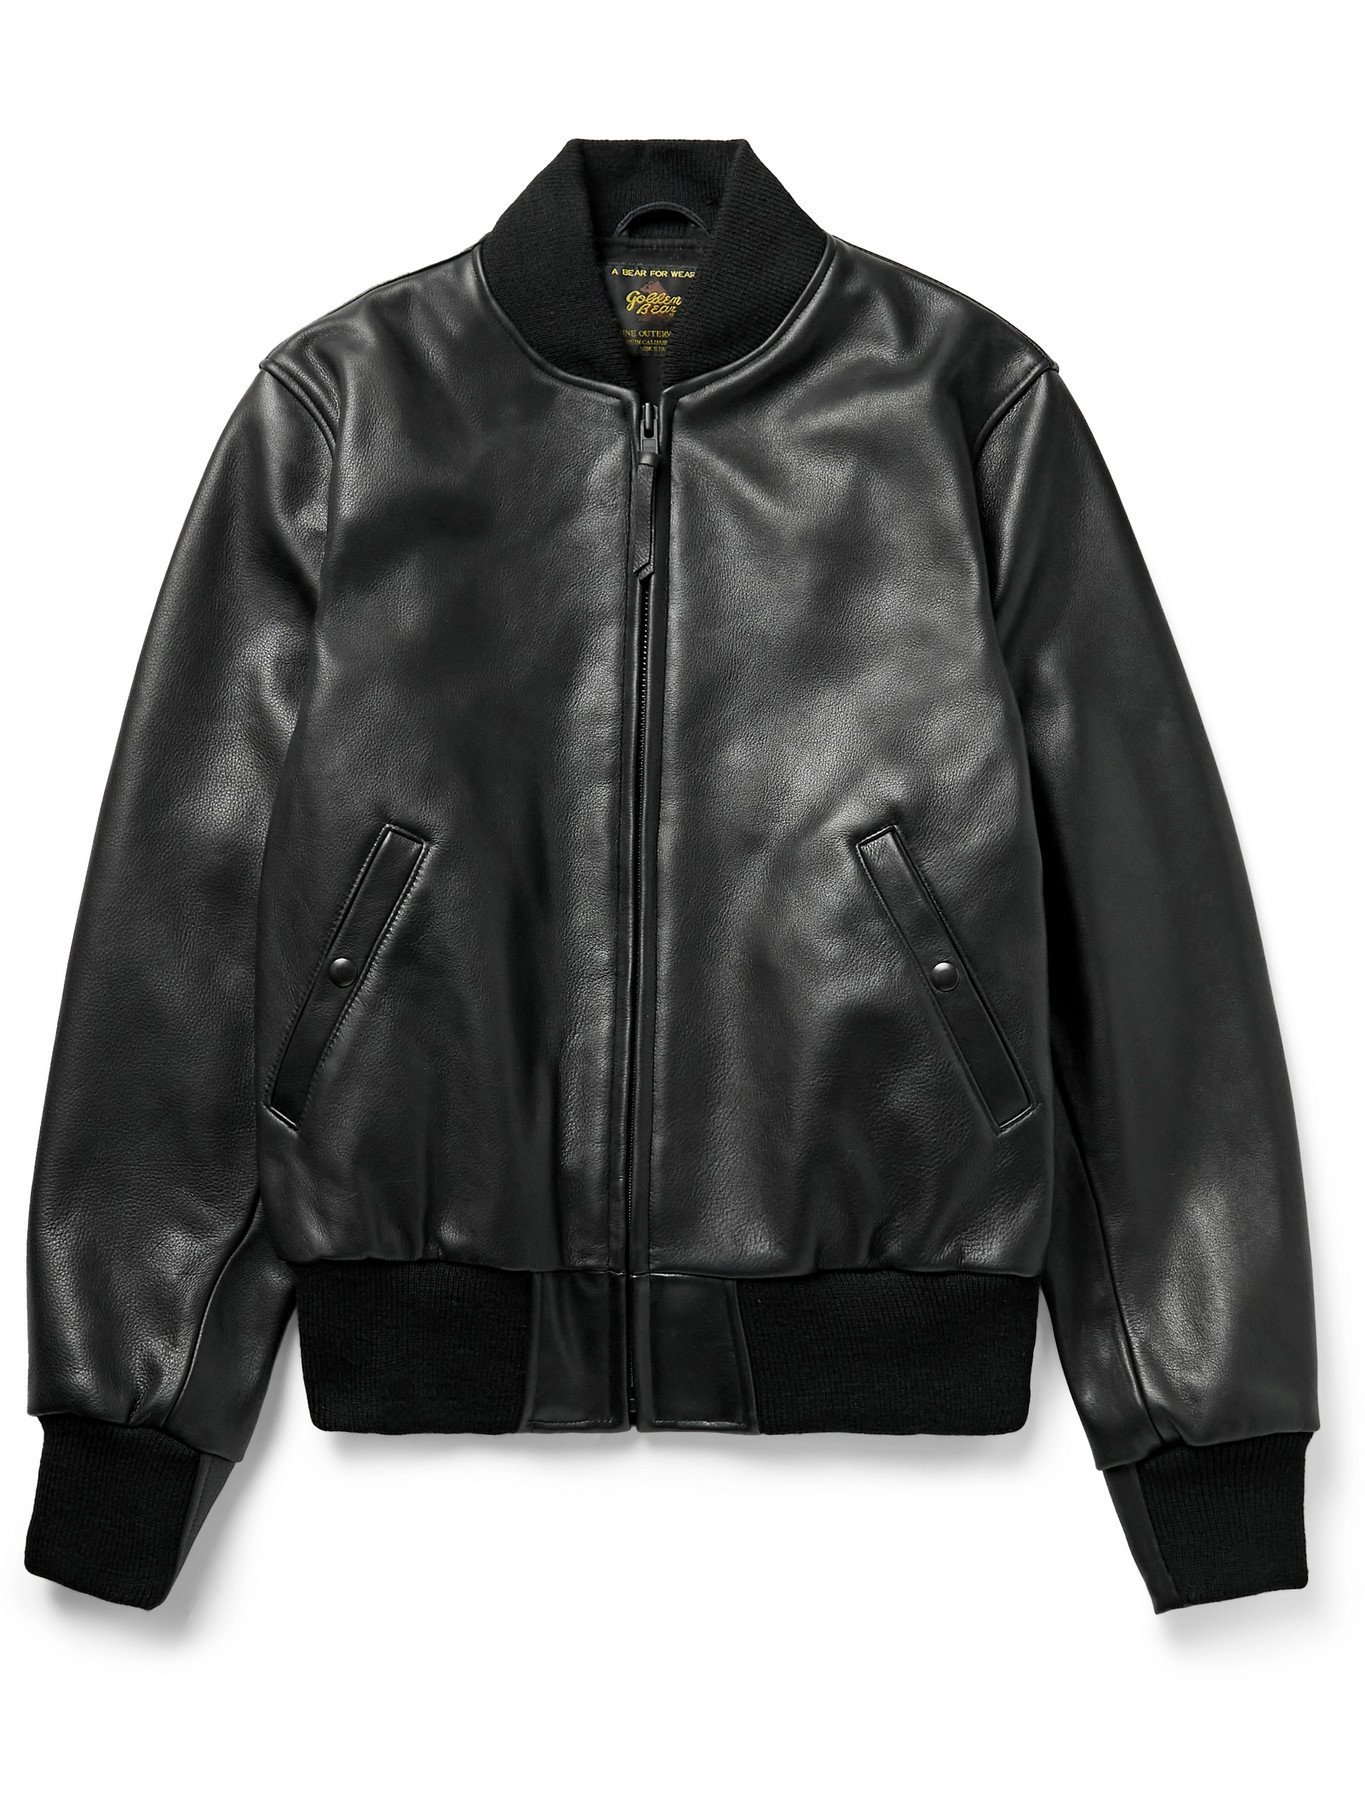 Photo: GOLDEN BEAR - Leather Bomber Jacket - Black - XS